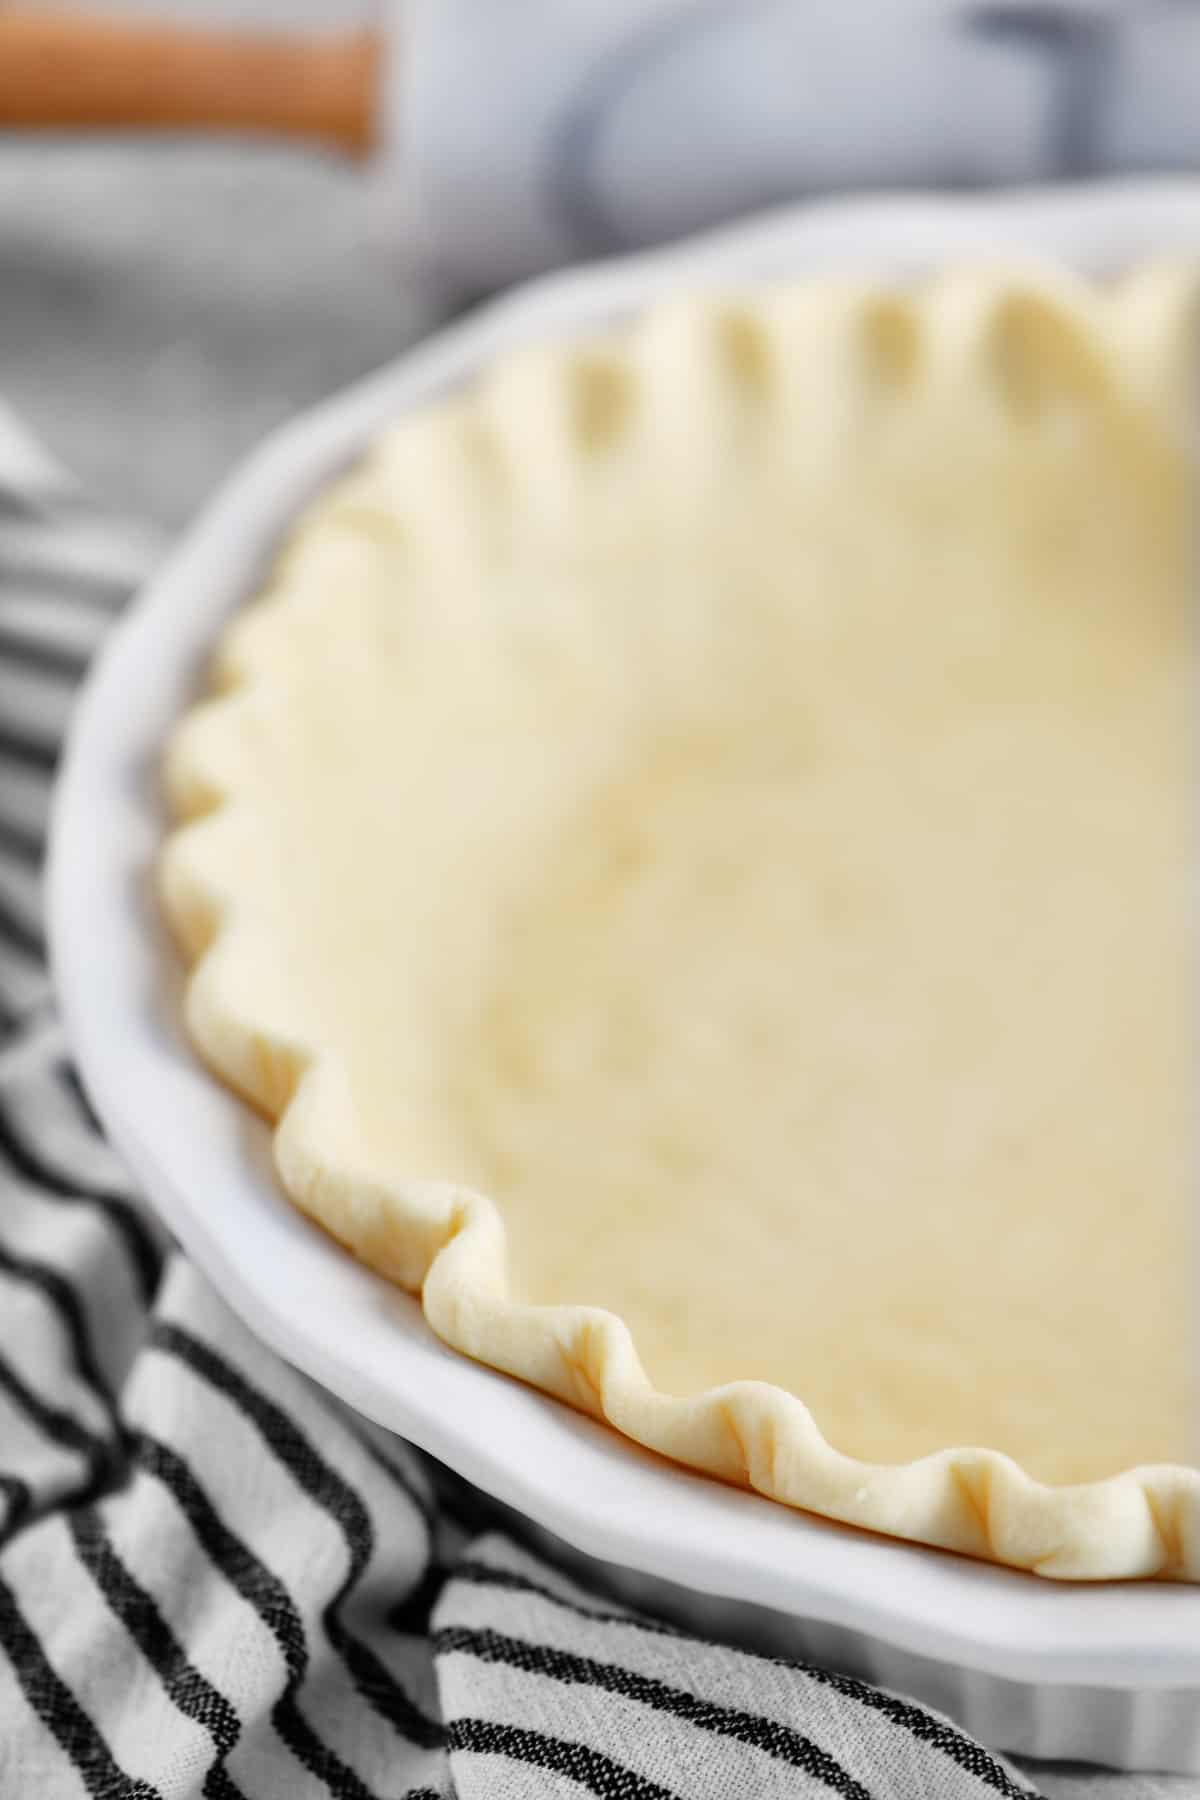 fluted pie crust dough in pan